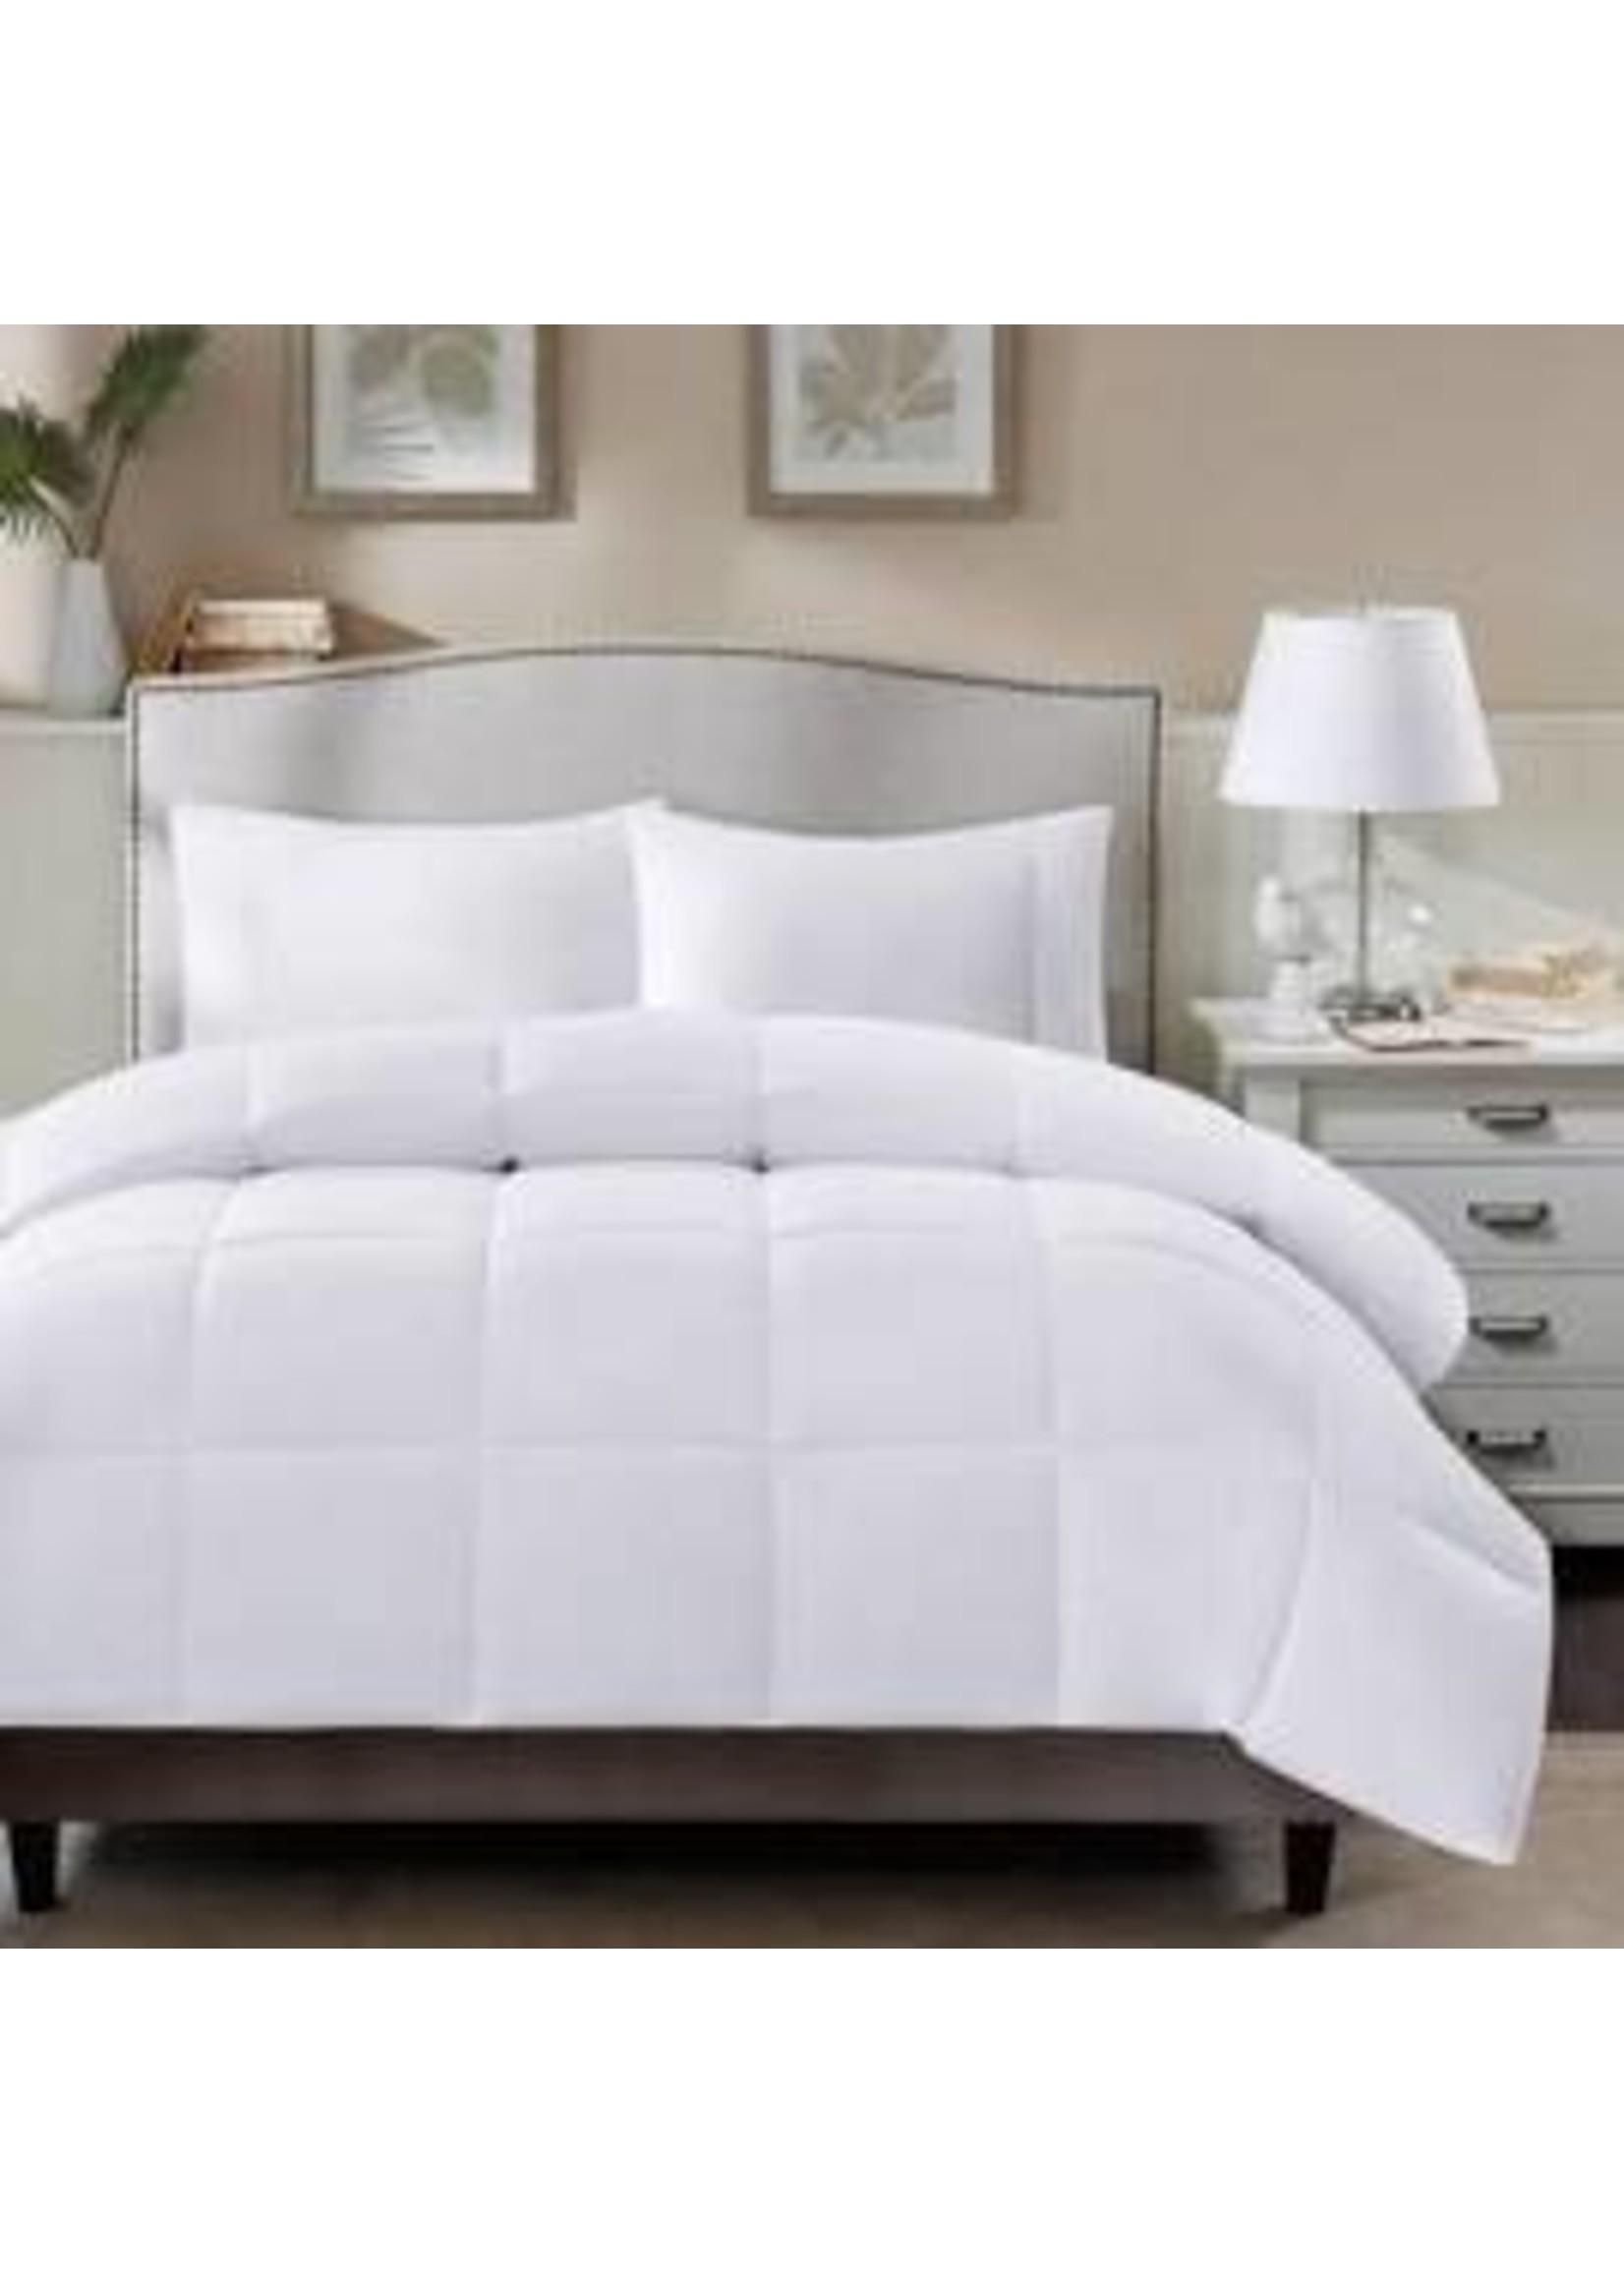 Olliix MP10-1250 OLLIIX Northfield All Season Stain Release 3M Cotton Twill Supreme Down Blend Comforter White QUEEN